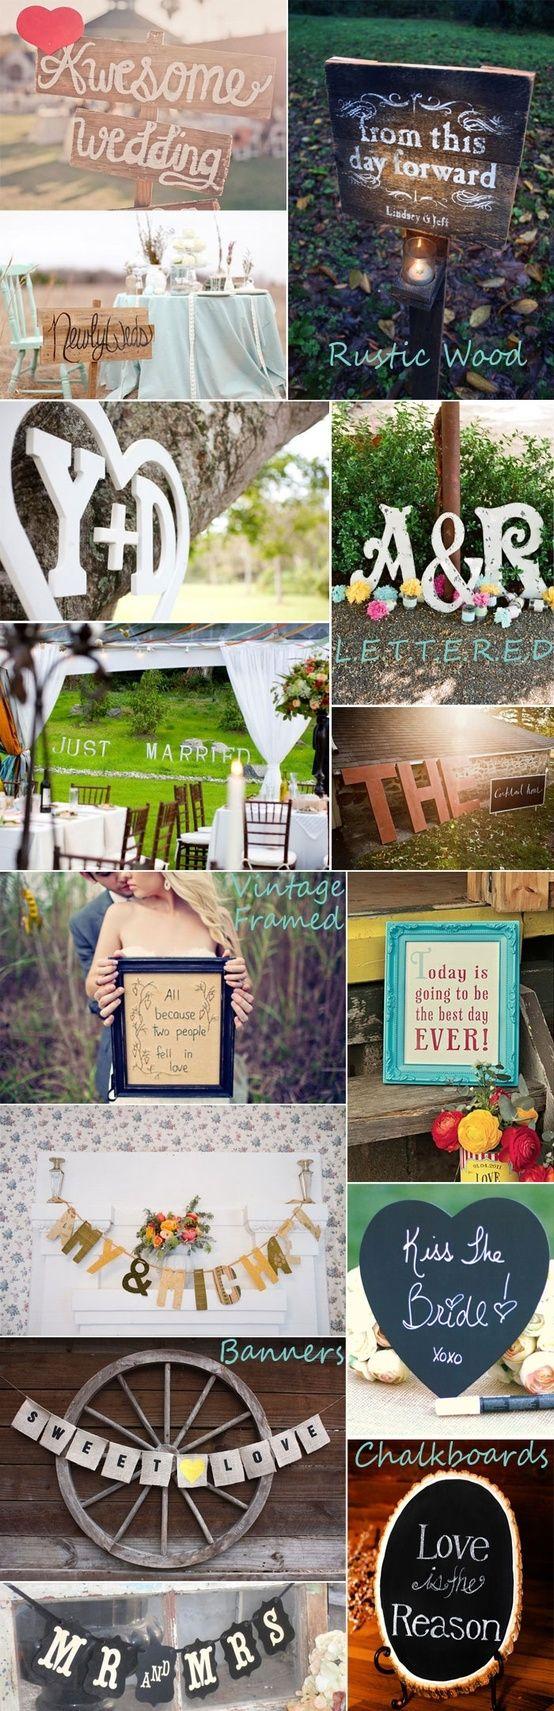 wedding signs -